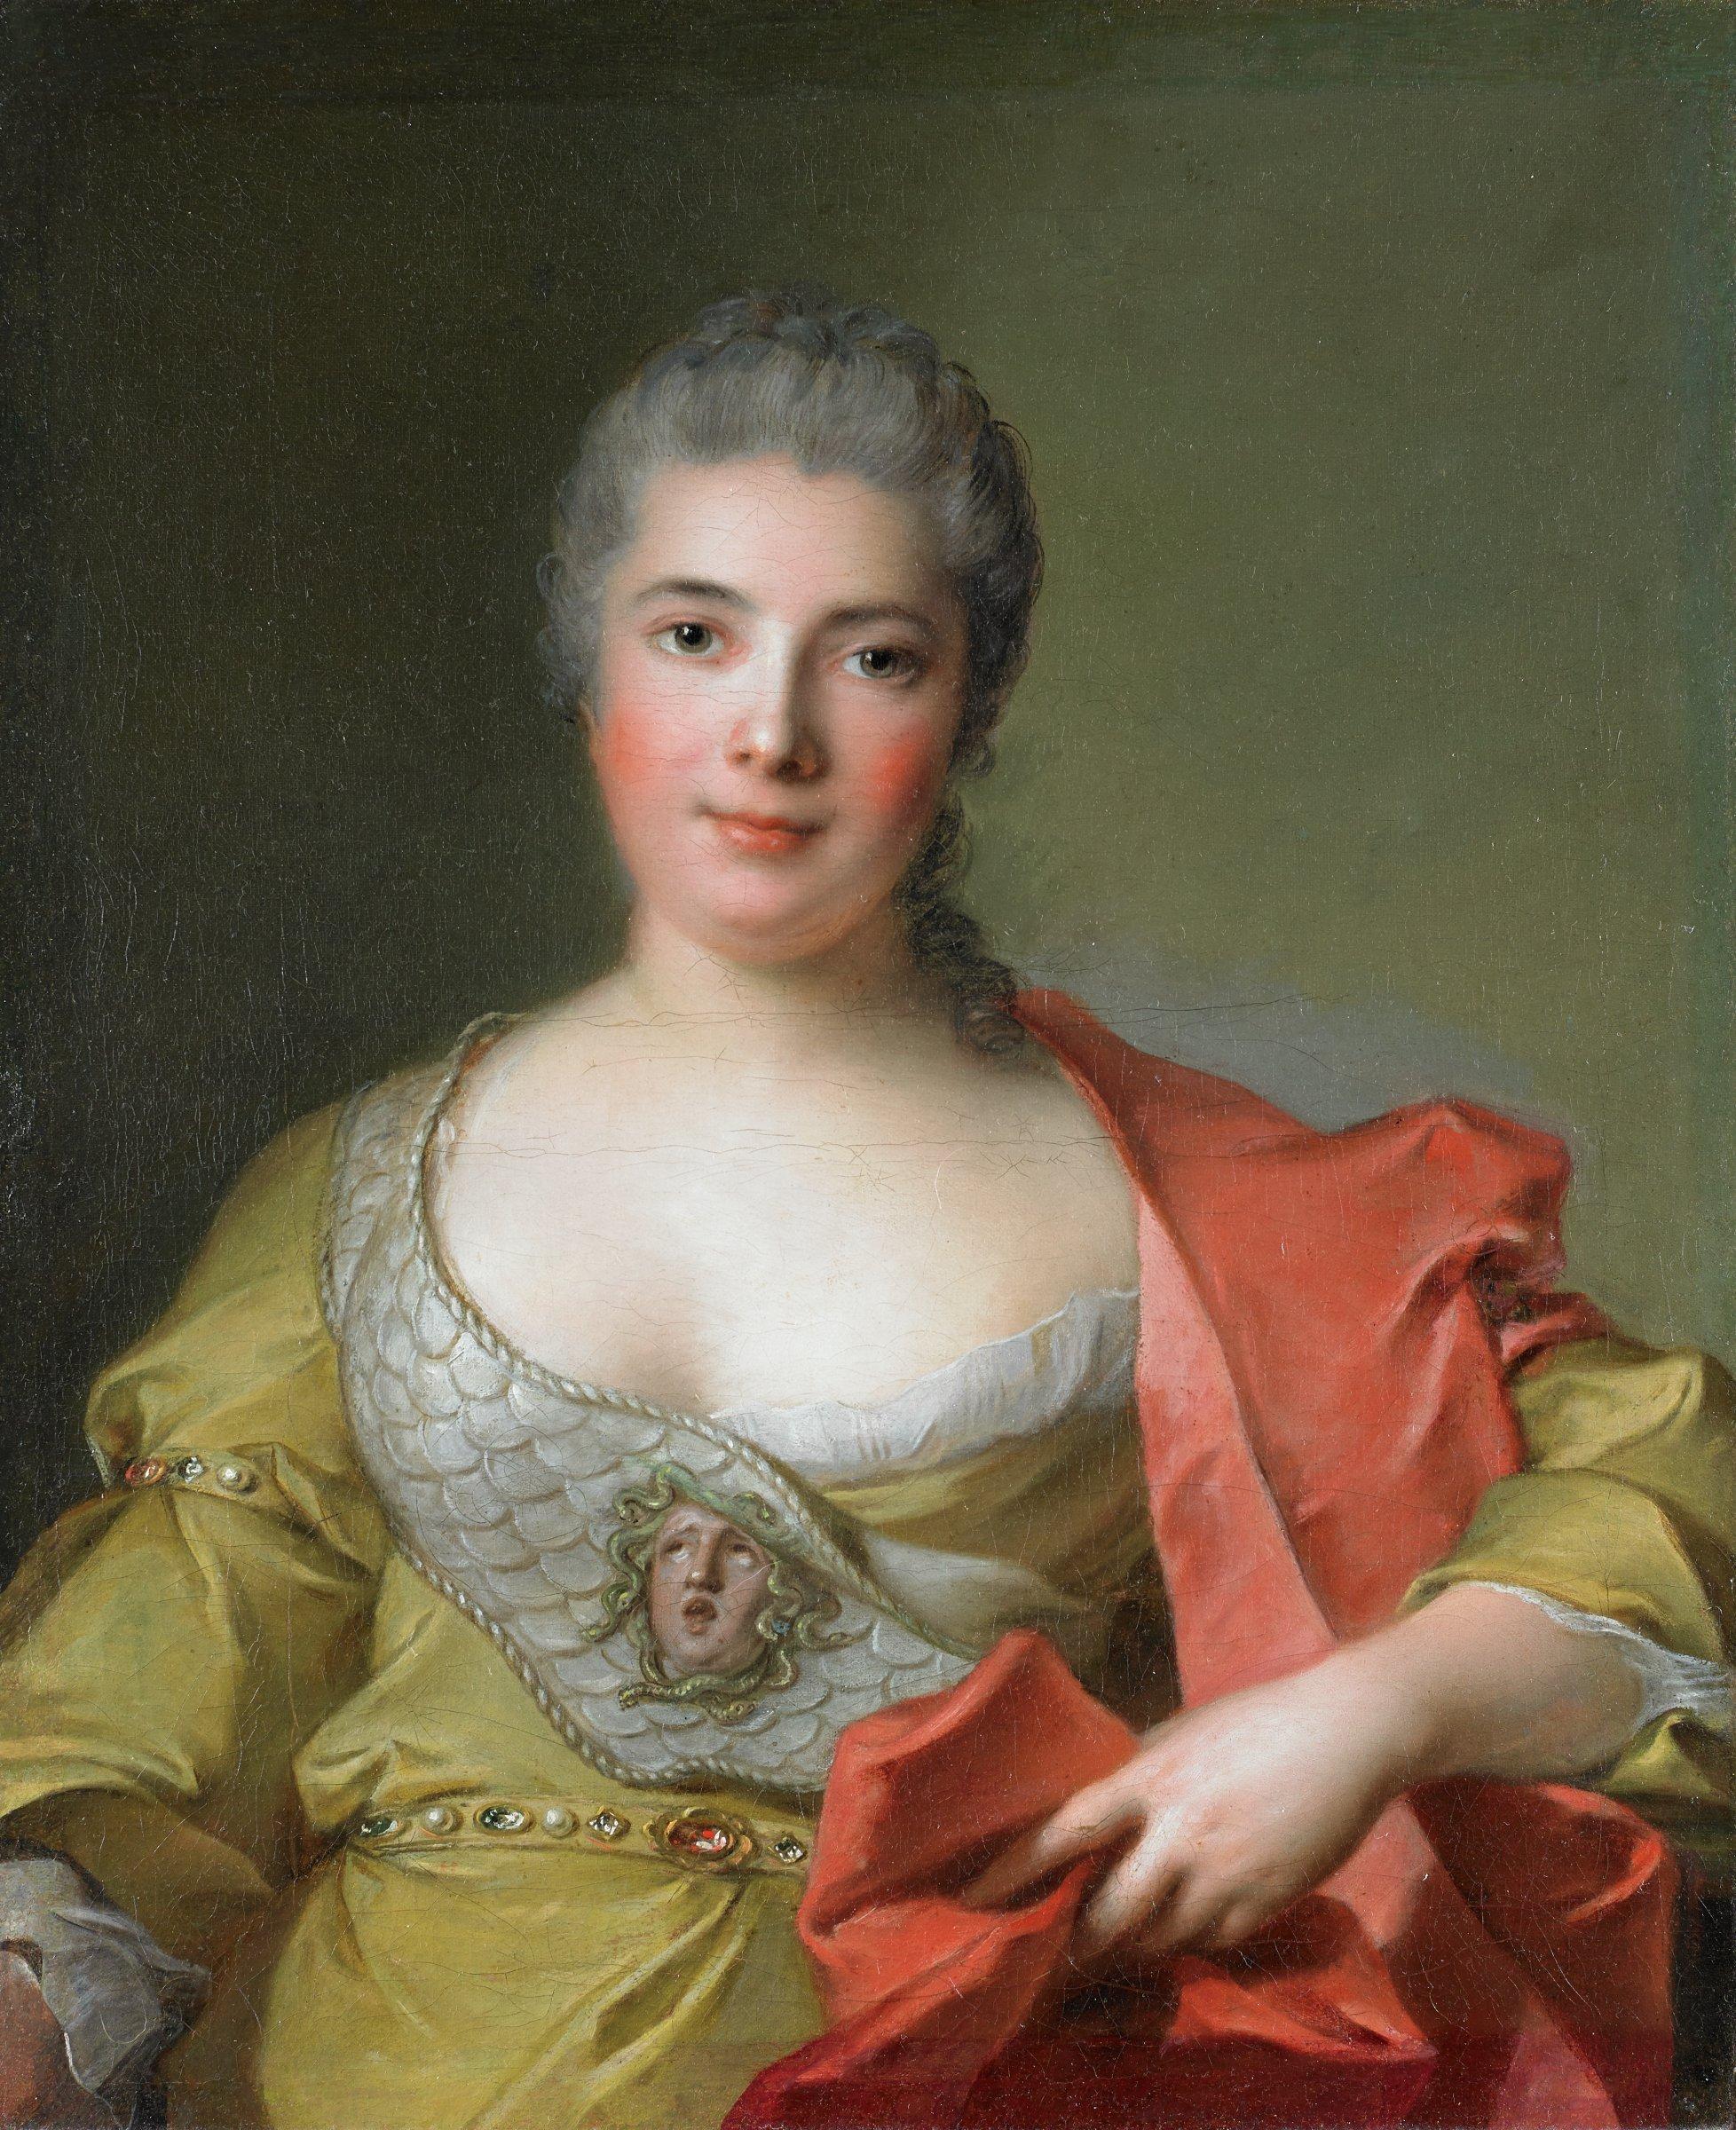 Adelaïde-Julie Mirleau de Neuville, Jean-Marc Nattier, oil on canvas